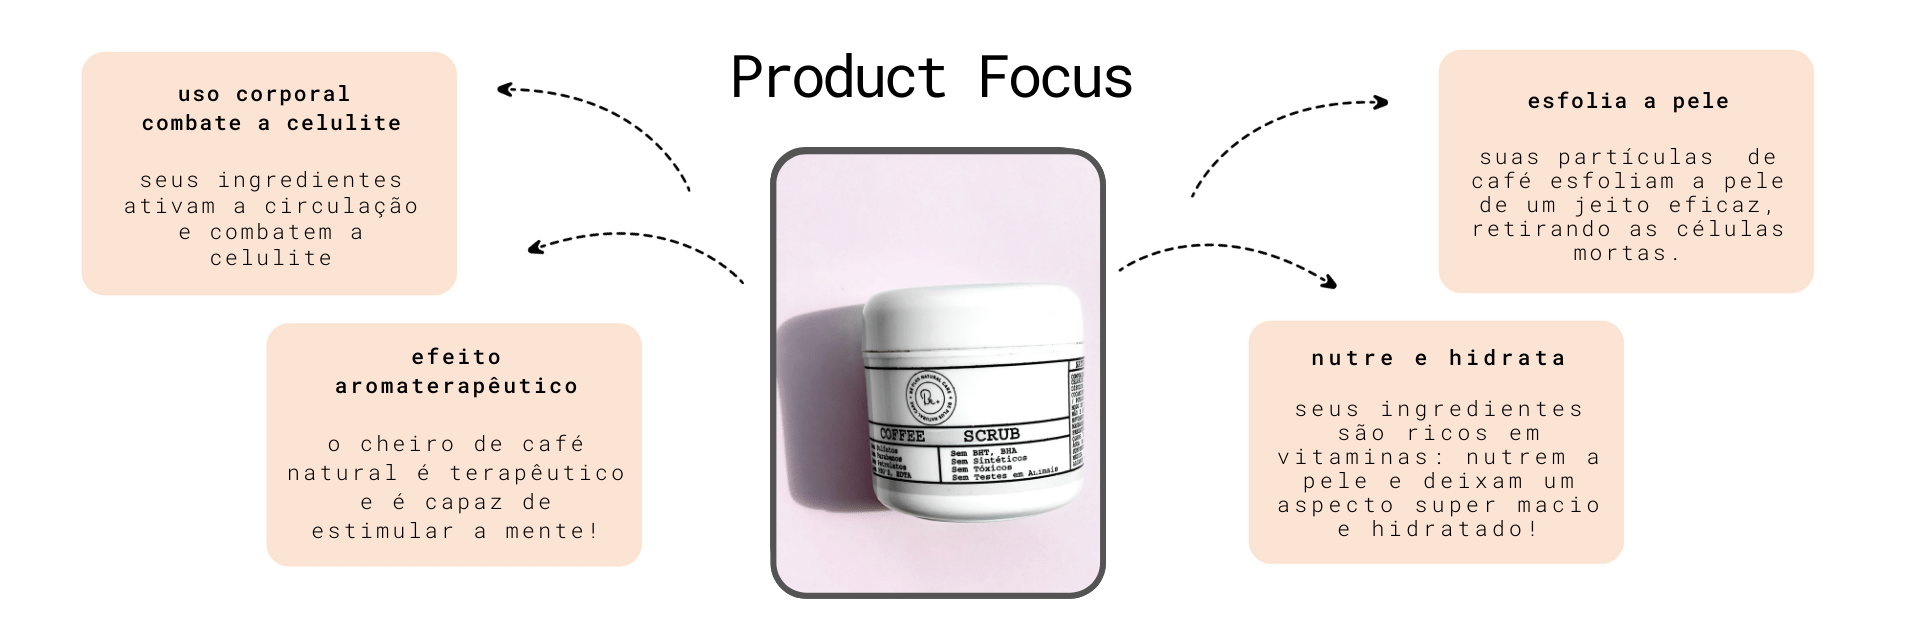 [Banner produto] esfoliante